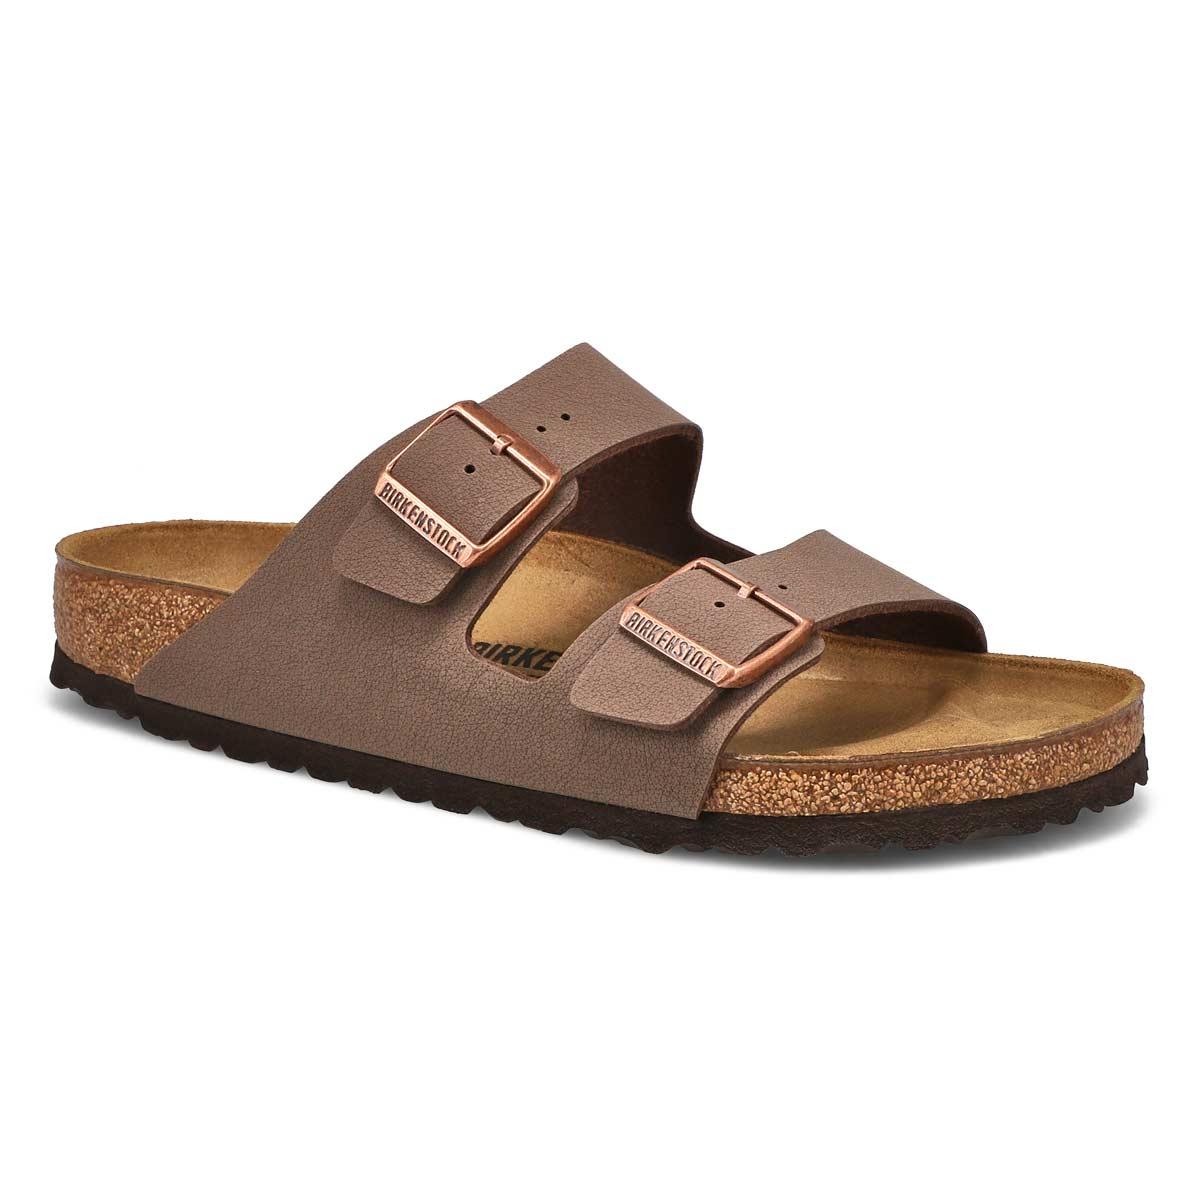 Men's Arizona BF Sandal - Mocha